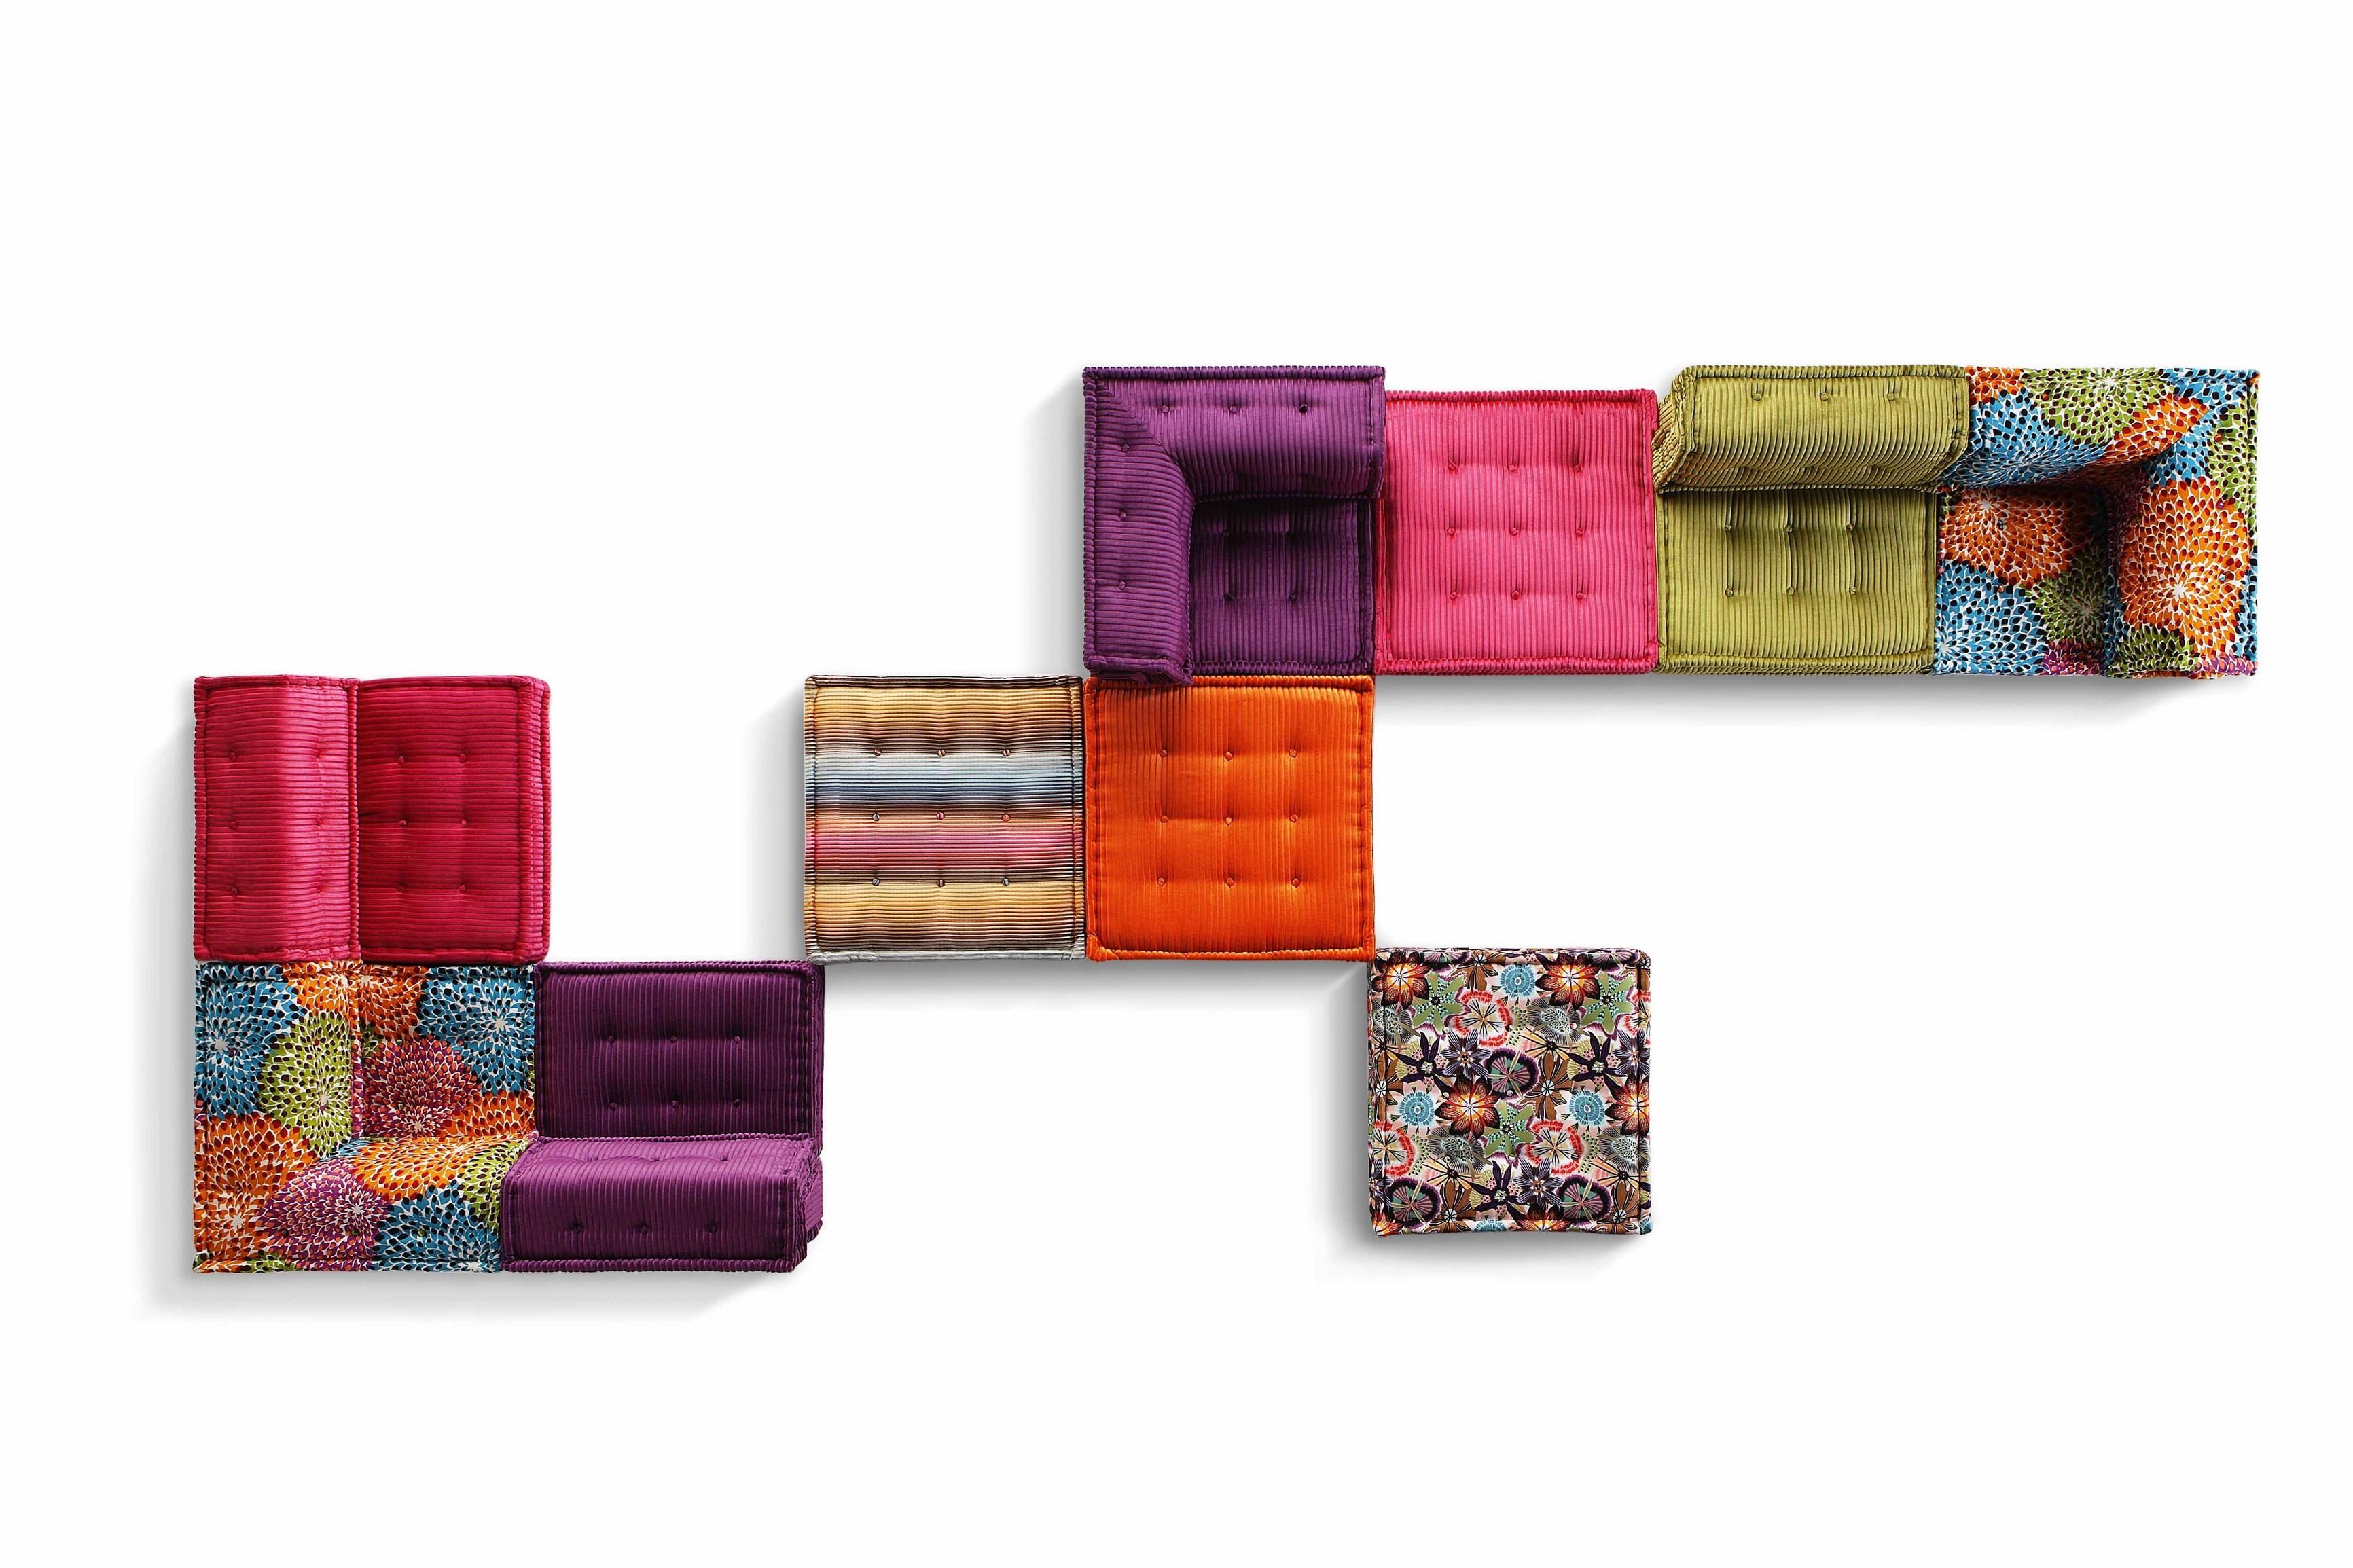 Sectional Fabric Sofa Mah Jong Missoni Homeroche Bobois Design Regarding Roche Bobois Mah Jong Sofas (Image 18 of 20)